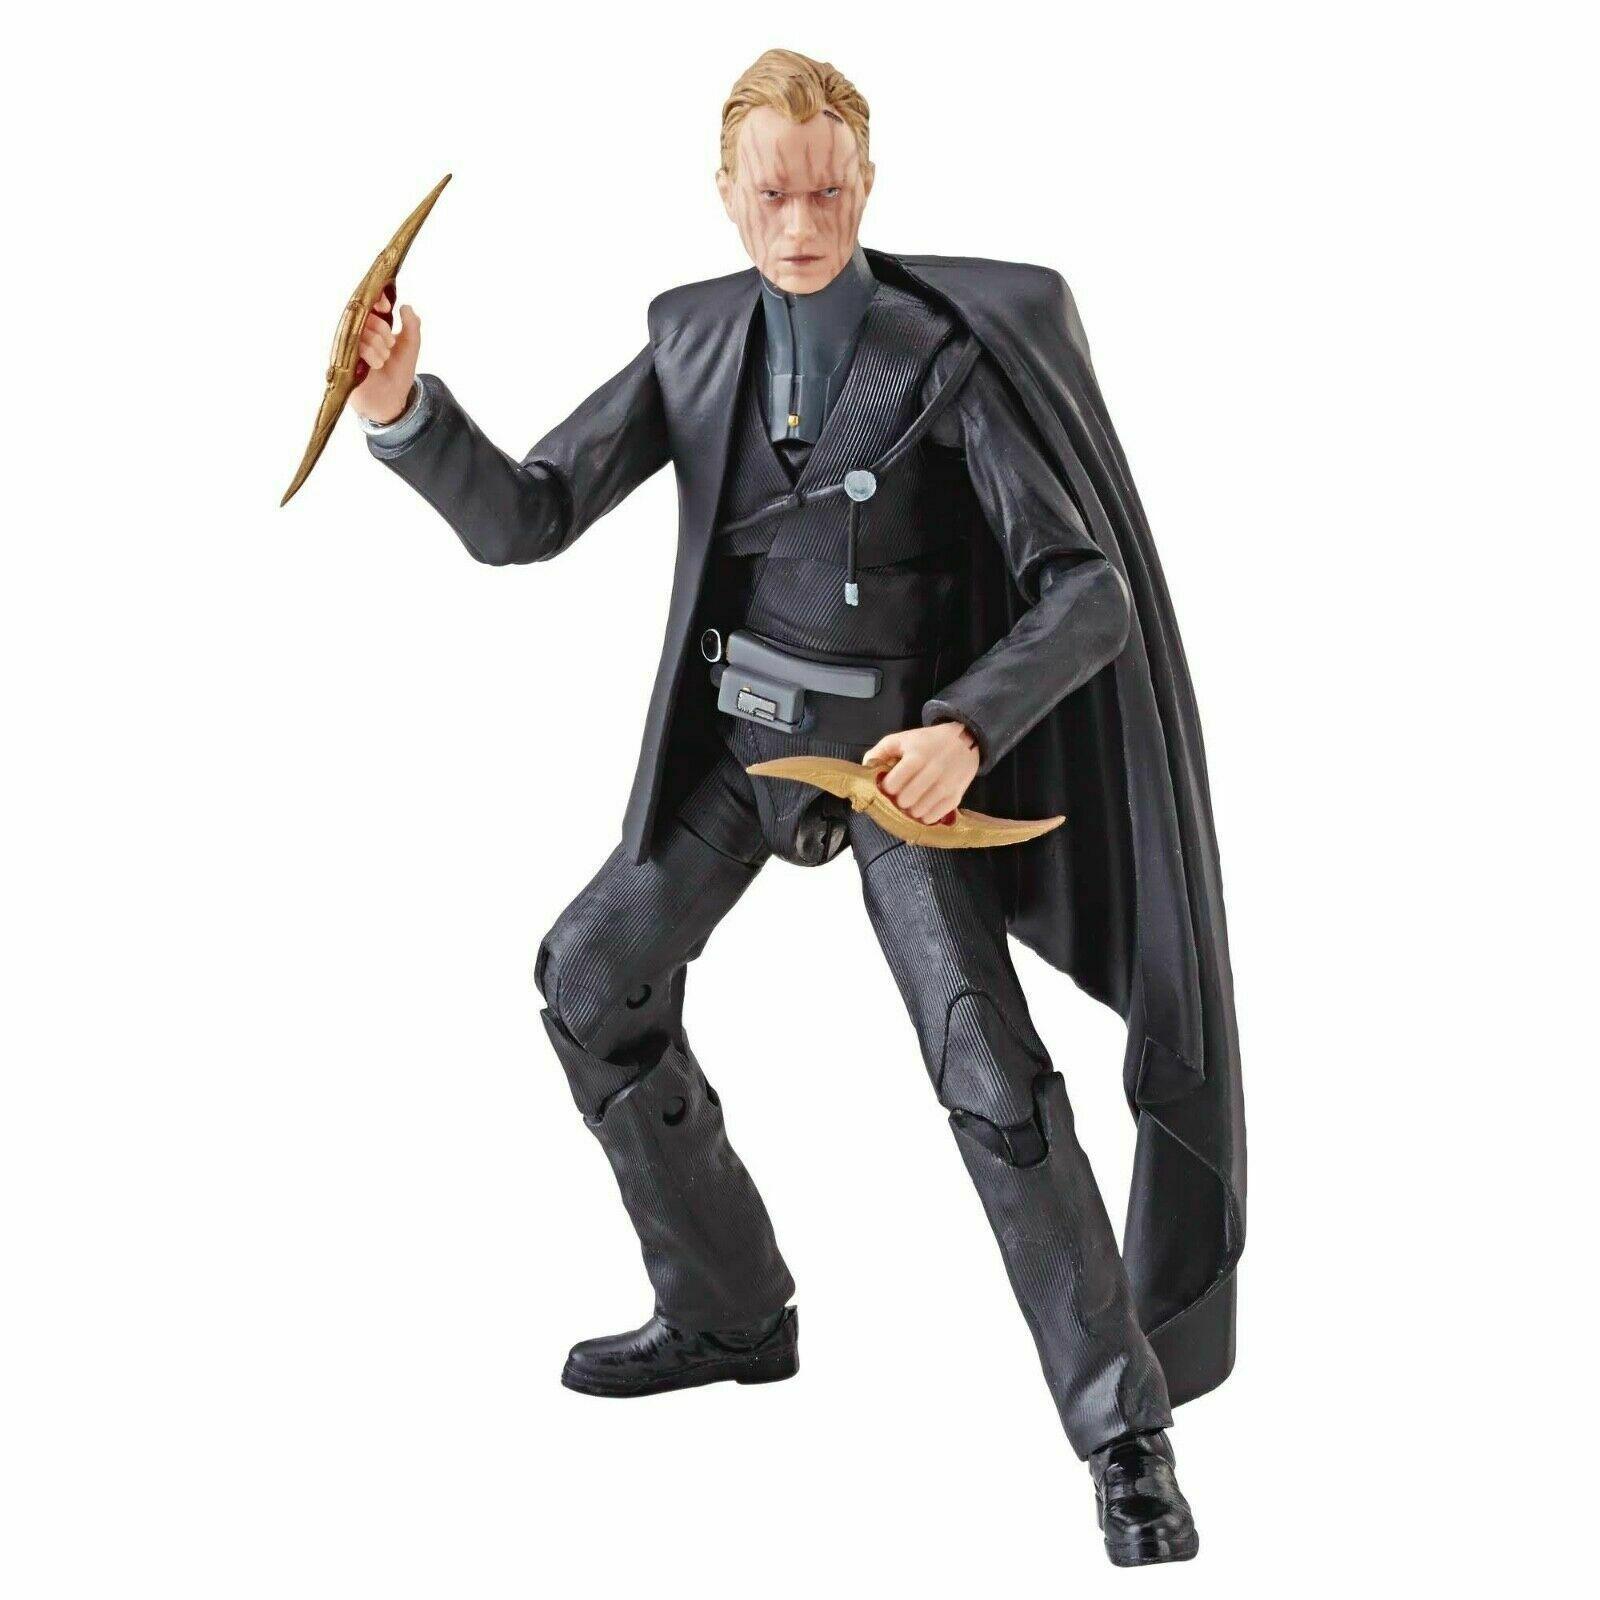 Star Wars the Black Series Dryden Vos 6 Inch Action Figure #79 MIB